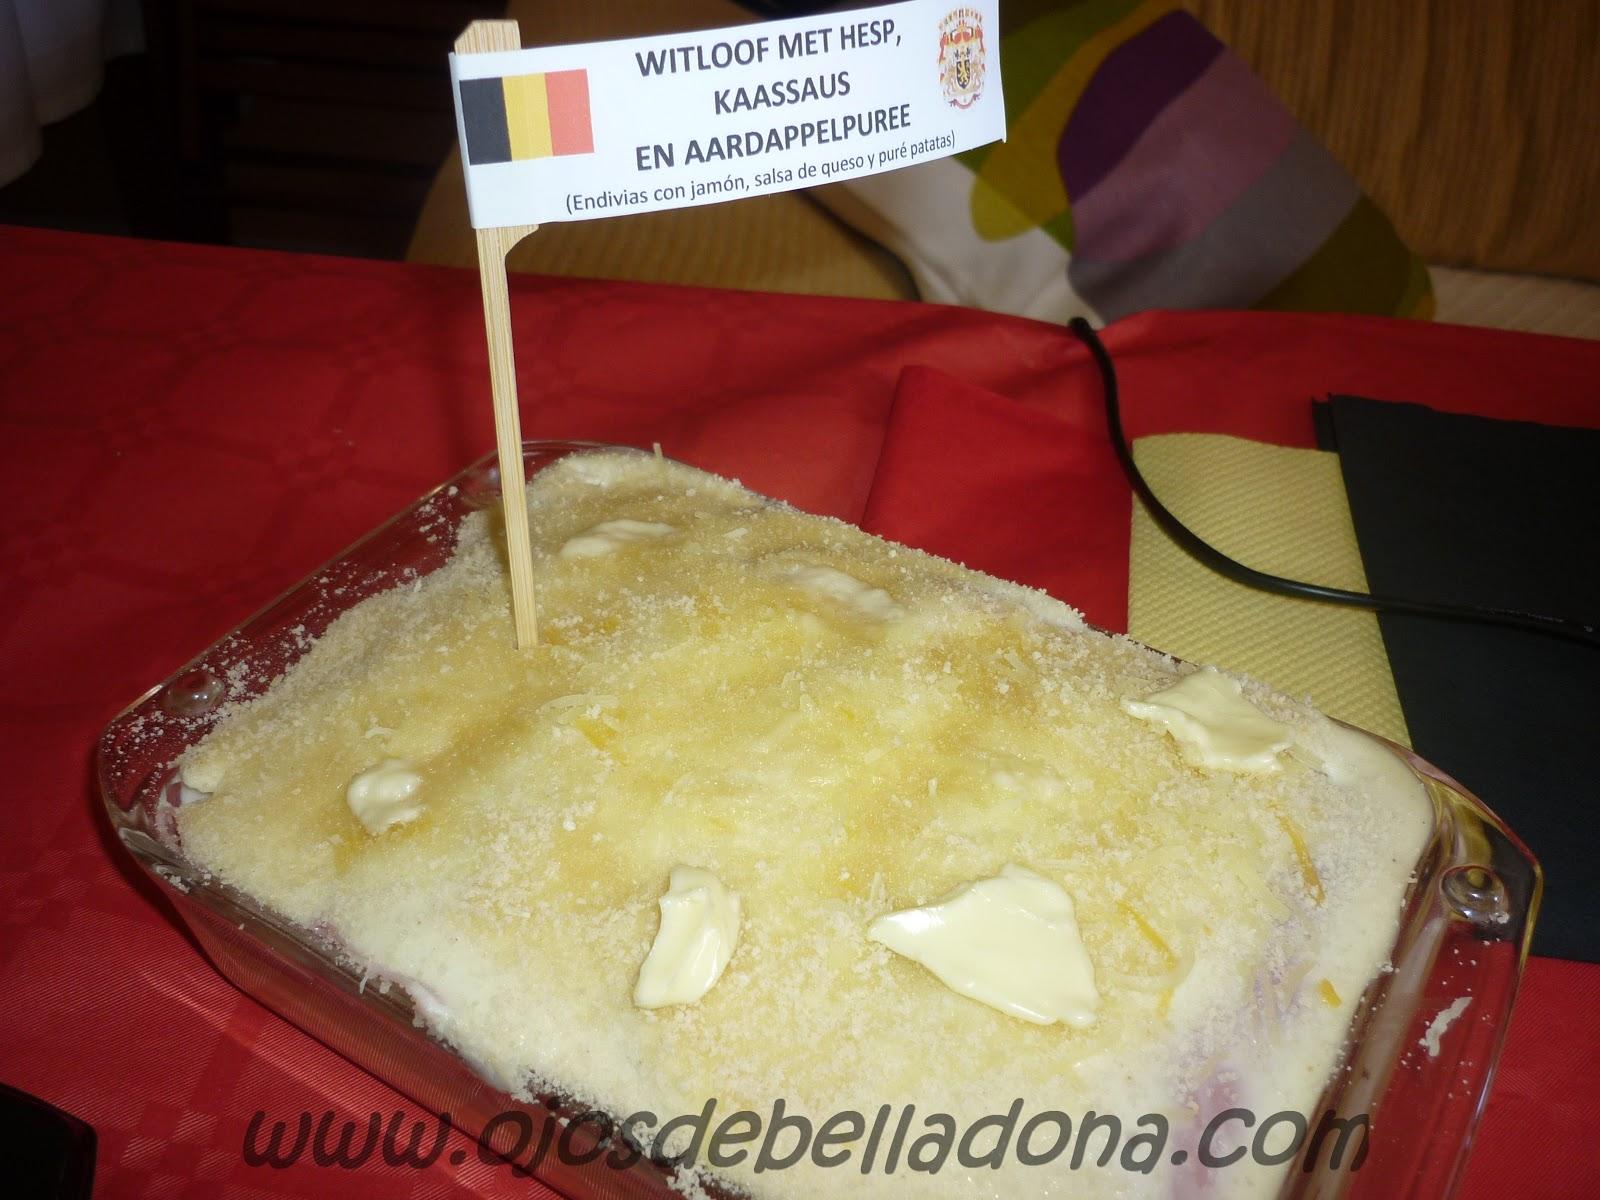 Witloof met hesp, kaassaus en aardappelpuree (Endivias con jamón, salsa de queso y puré de patatas), Bélgica